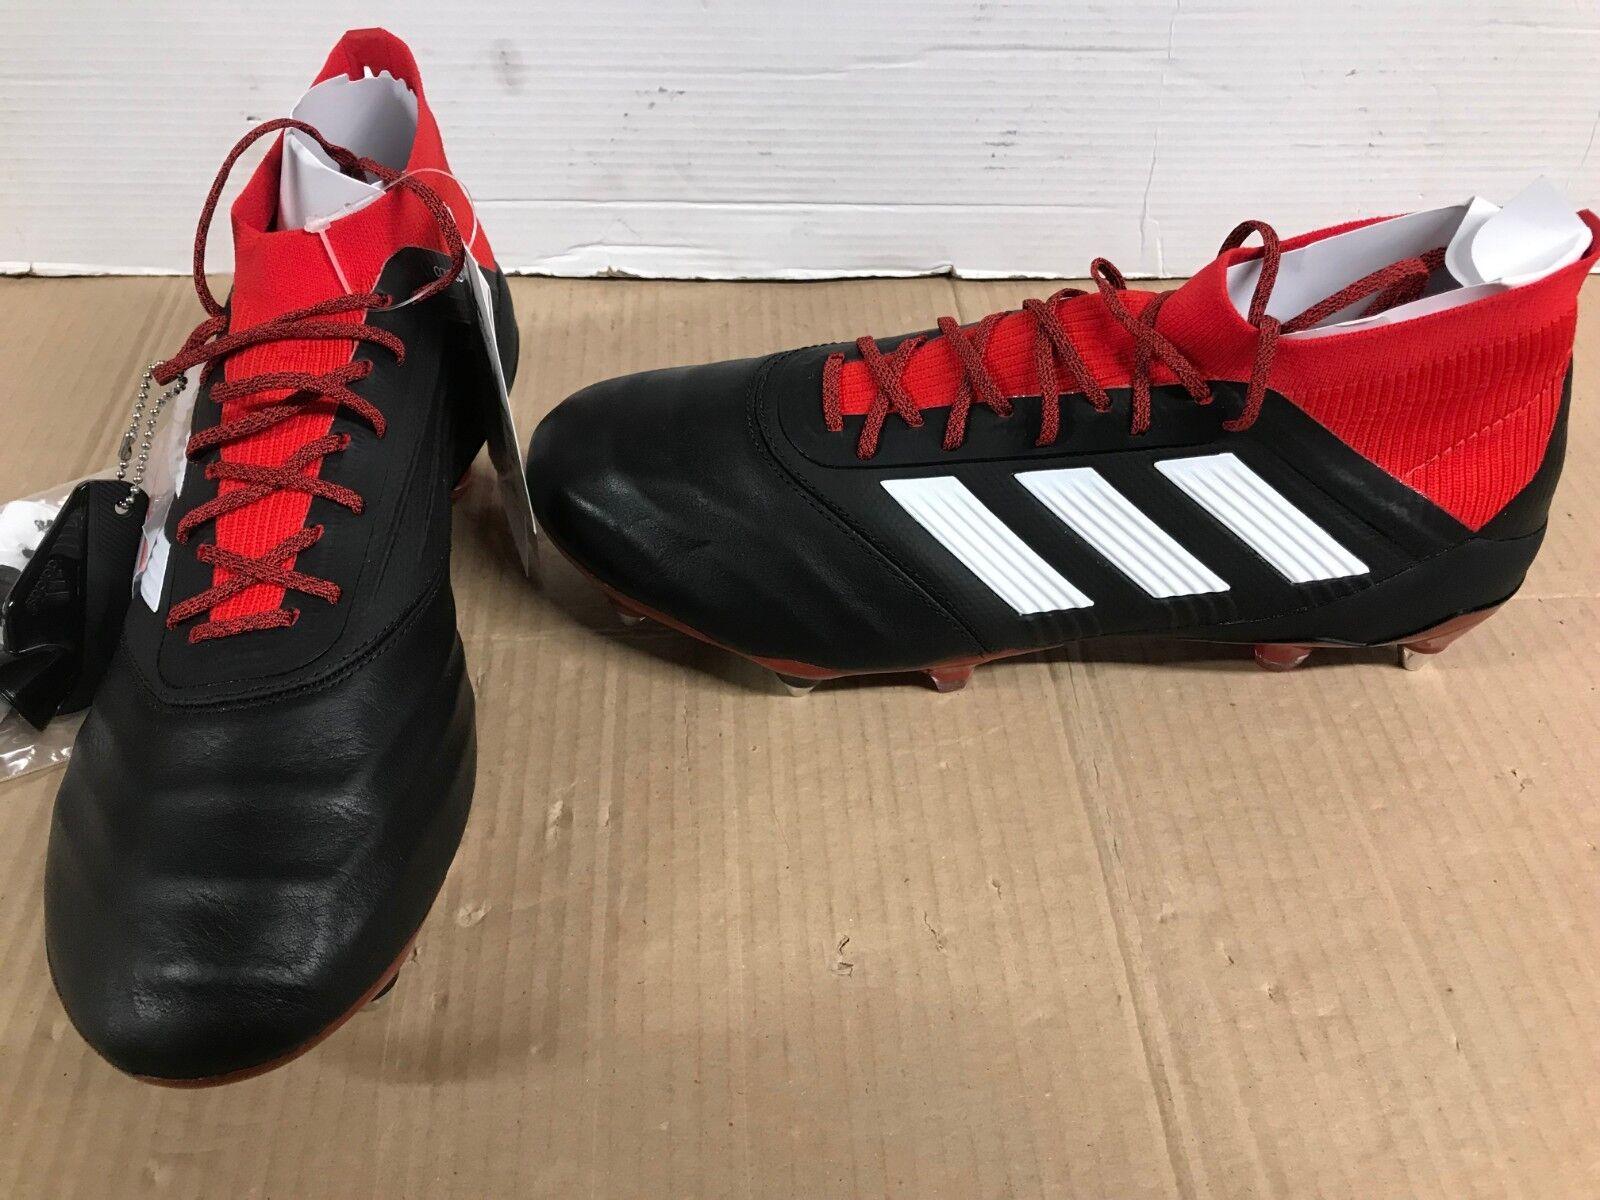 264884cda893 adidas Predator 18.1 SG Le Football BOOTS Black Red Sock UK 8.5 EUR ...